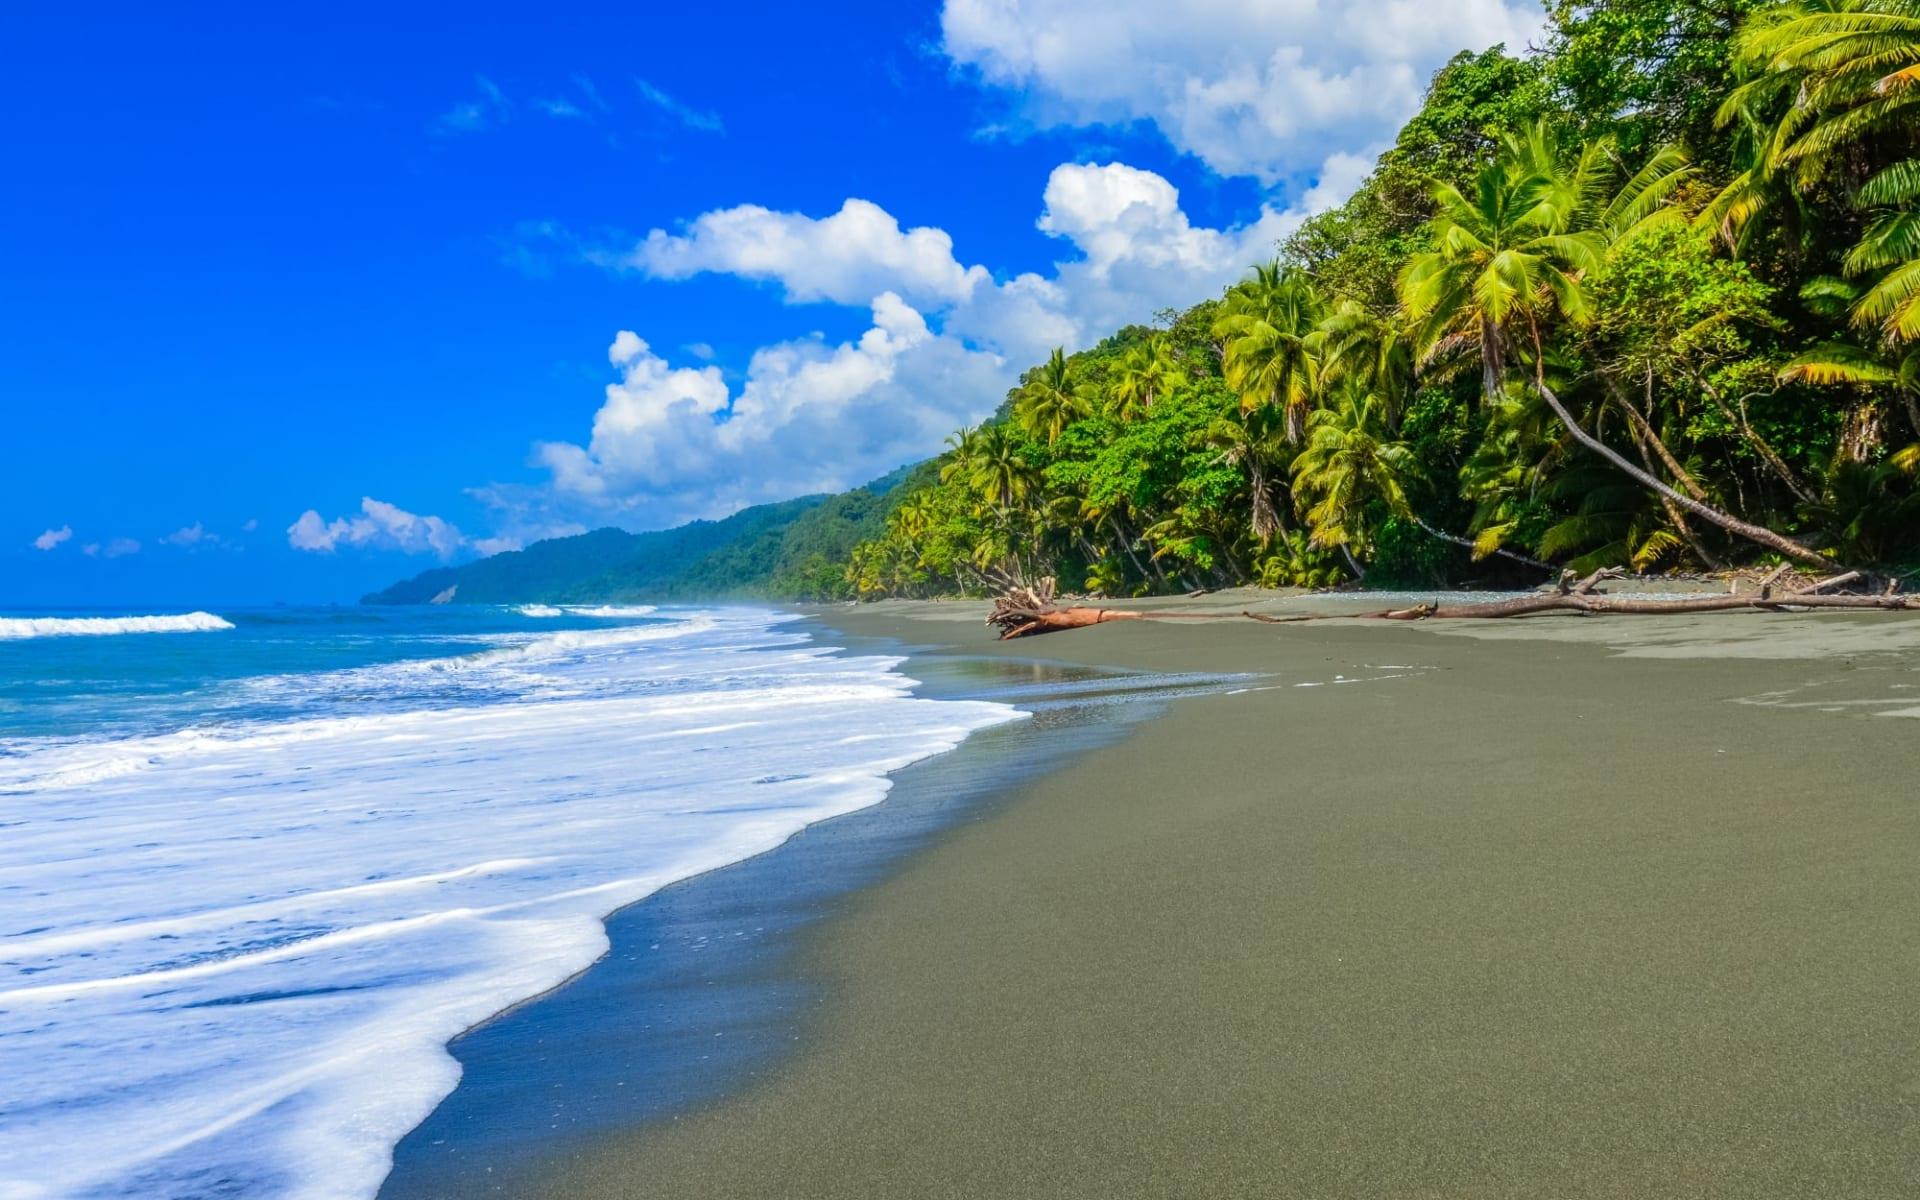 Aguila de Osa Inn ab Osa Peninsula: Costa Rica - Corcovado National Park - dunkler Strand